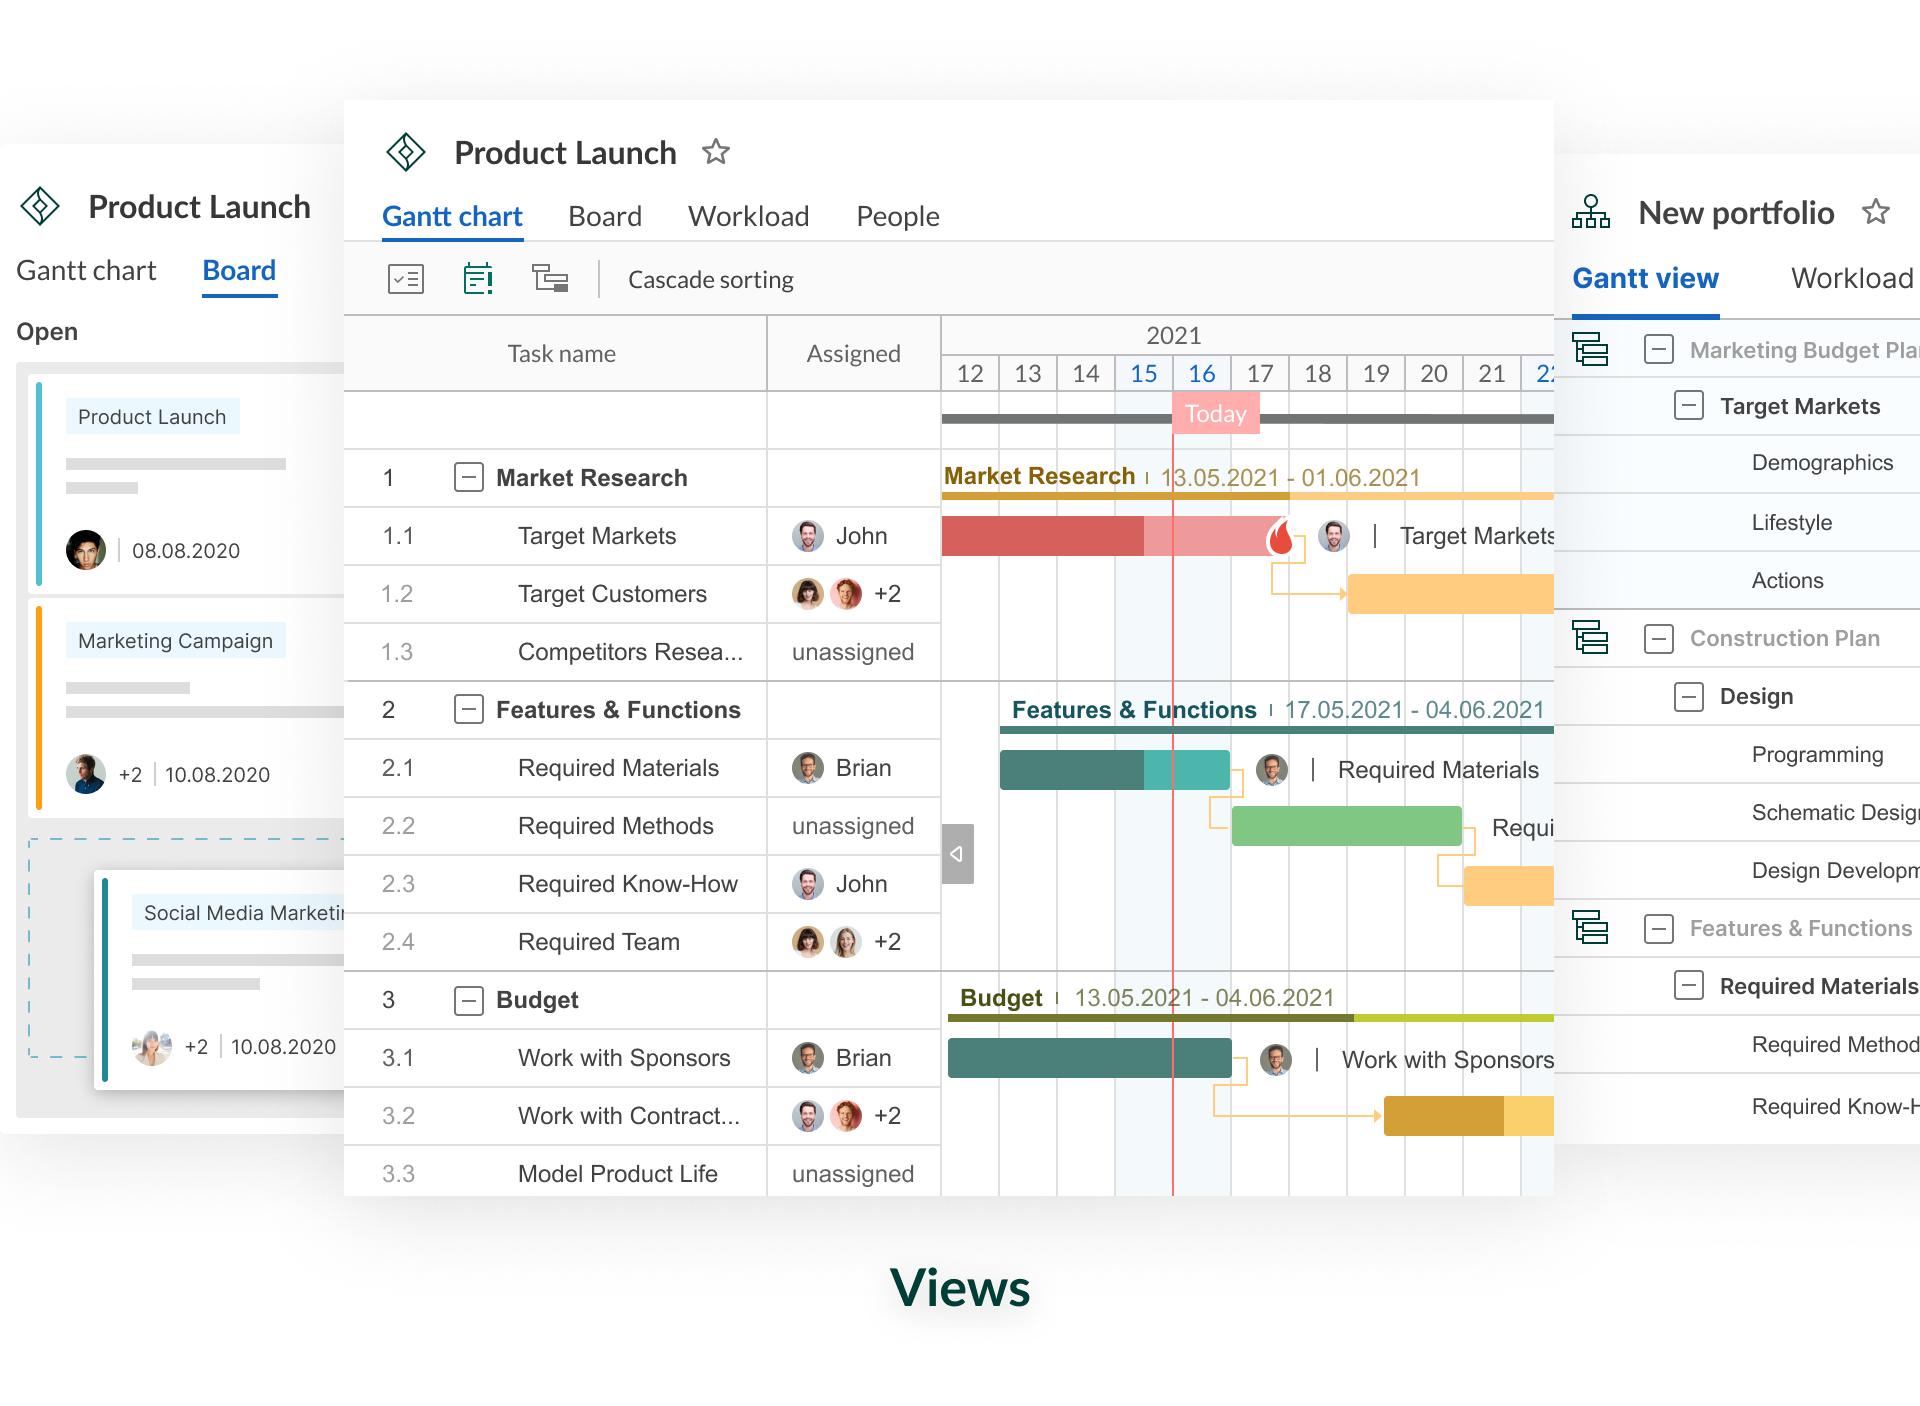 GanttPRO Software - Views